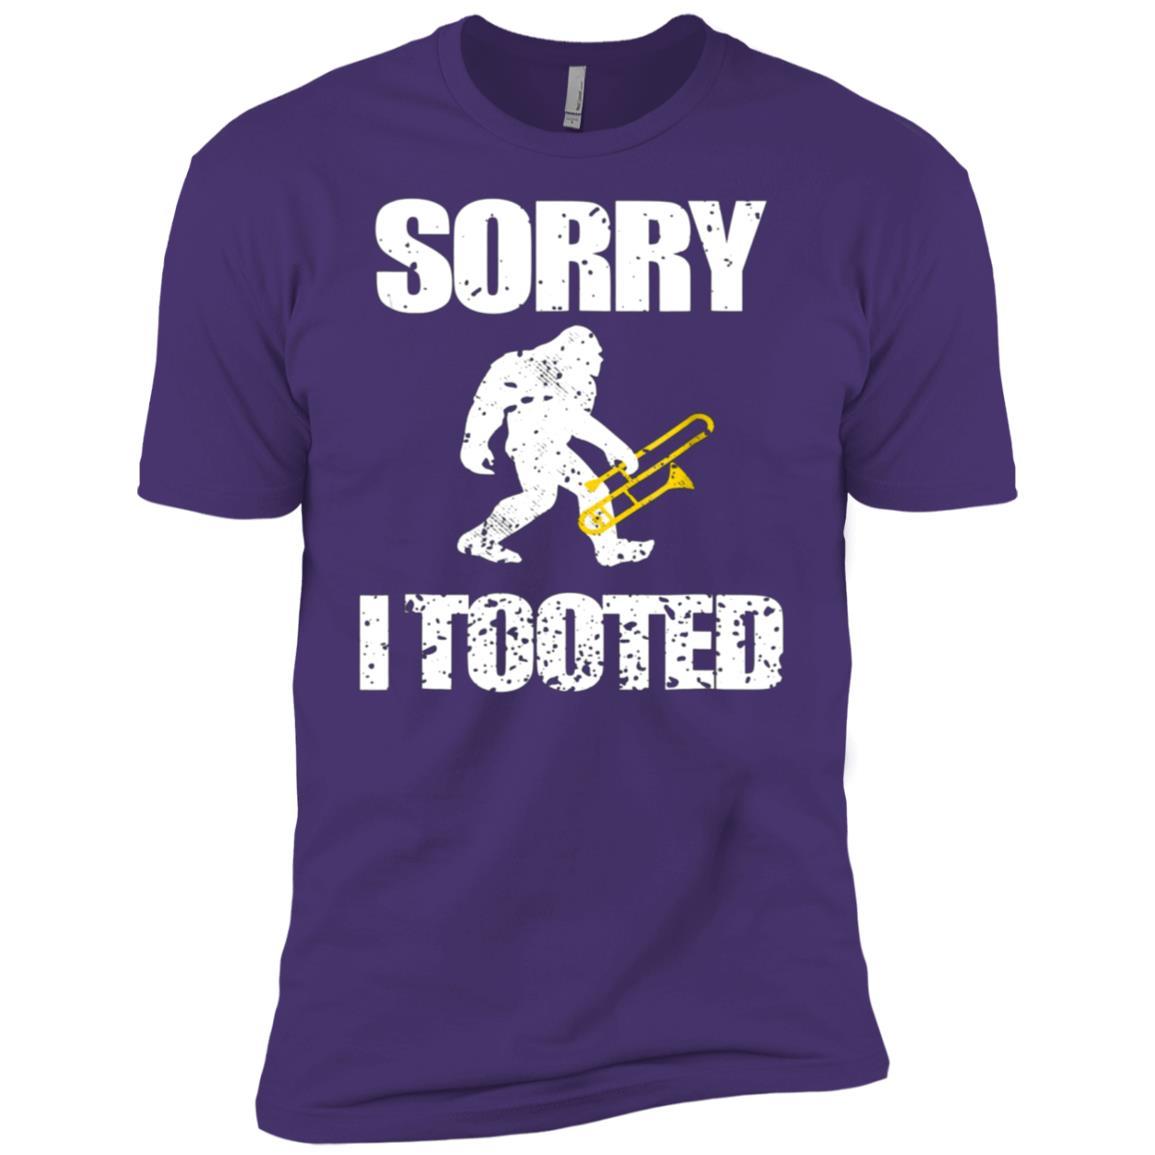 Funny Trombone Cool Bigfoot Gift Men Women Kids Men Short Sleeve T-Shirt